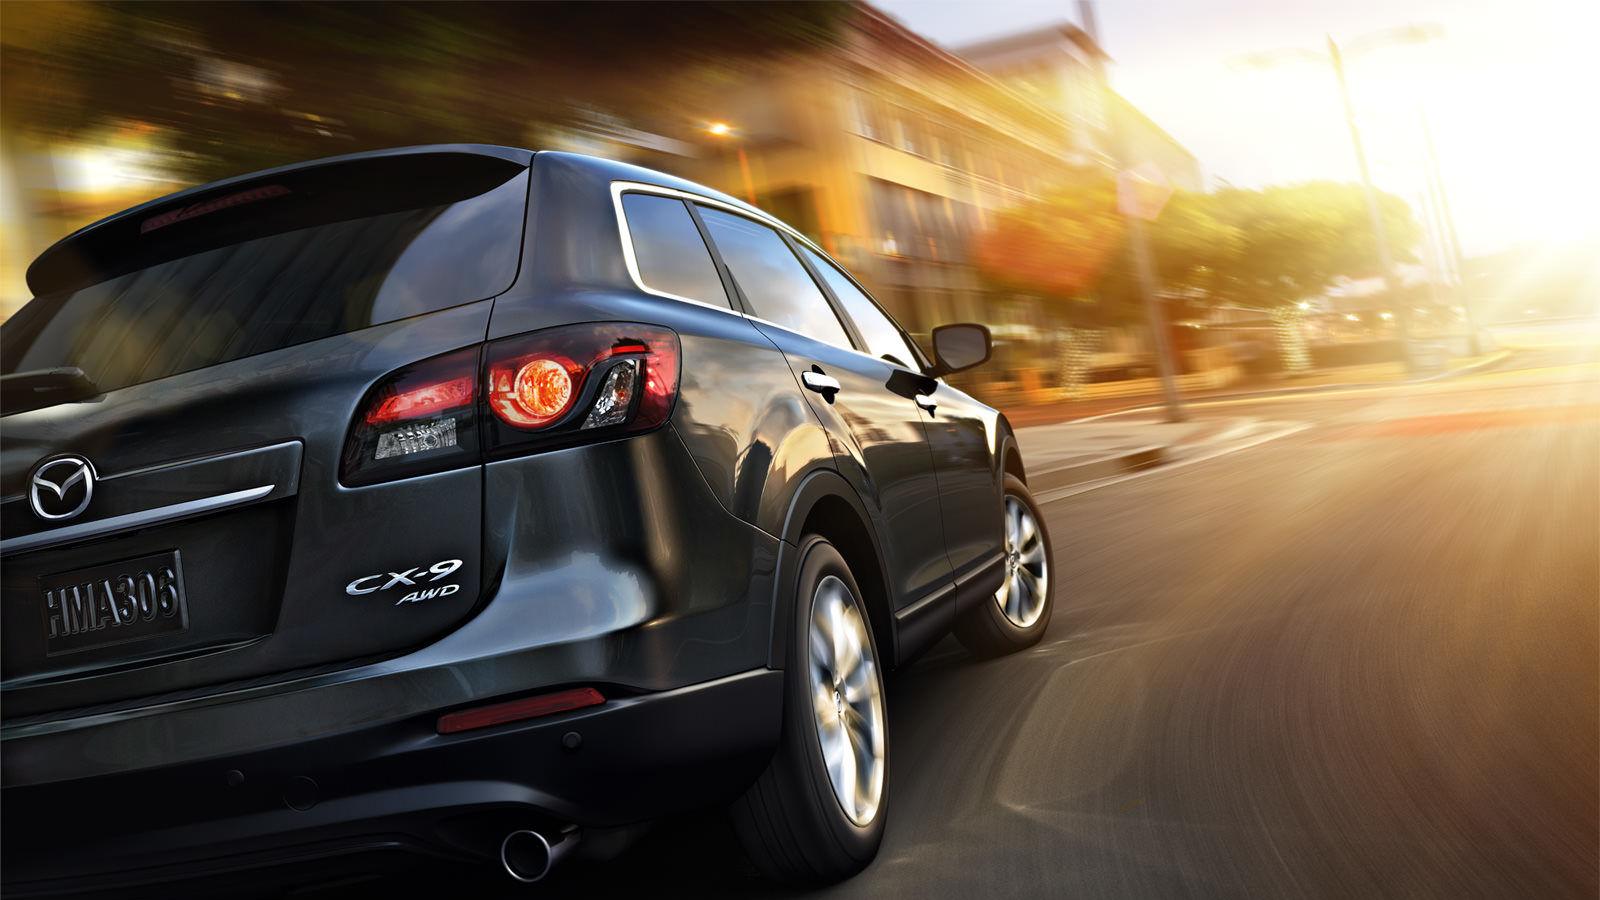 Kramer Mazda | 2015 Mazda CX-9 – Comfortable, spacious, and fun to drive Picture 2